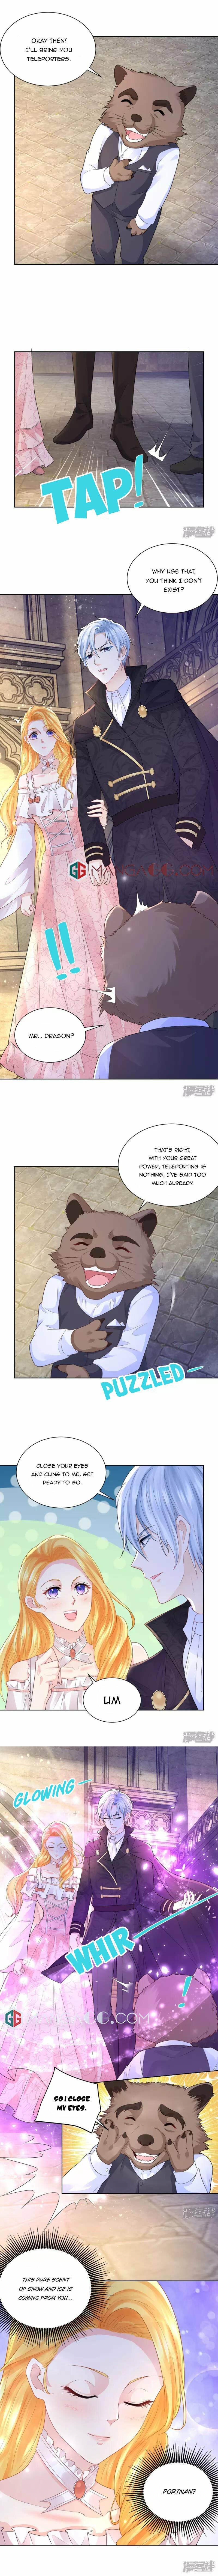 I Just Want To Be A Useless Duke's Daughter Chapter 132 page 2 - Mangakakalots.com